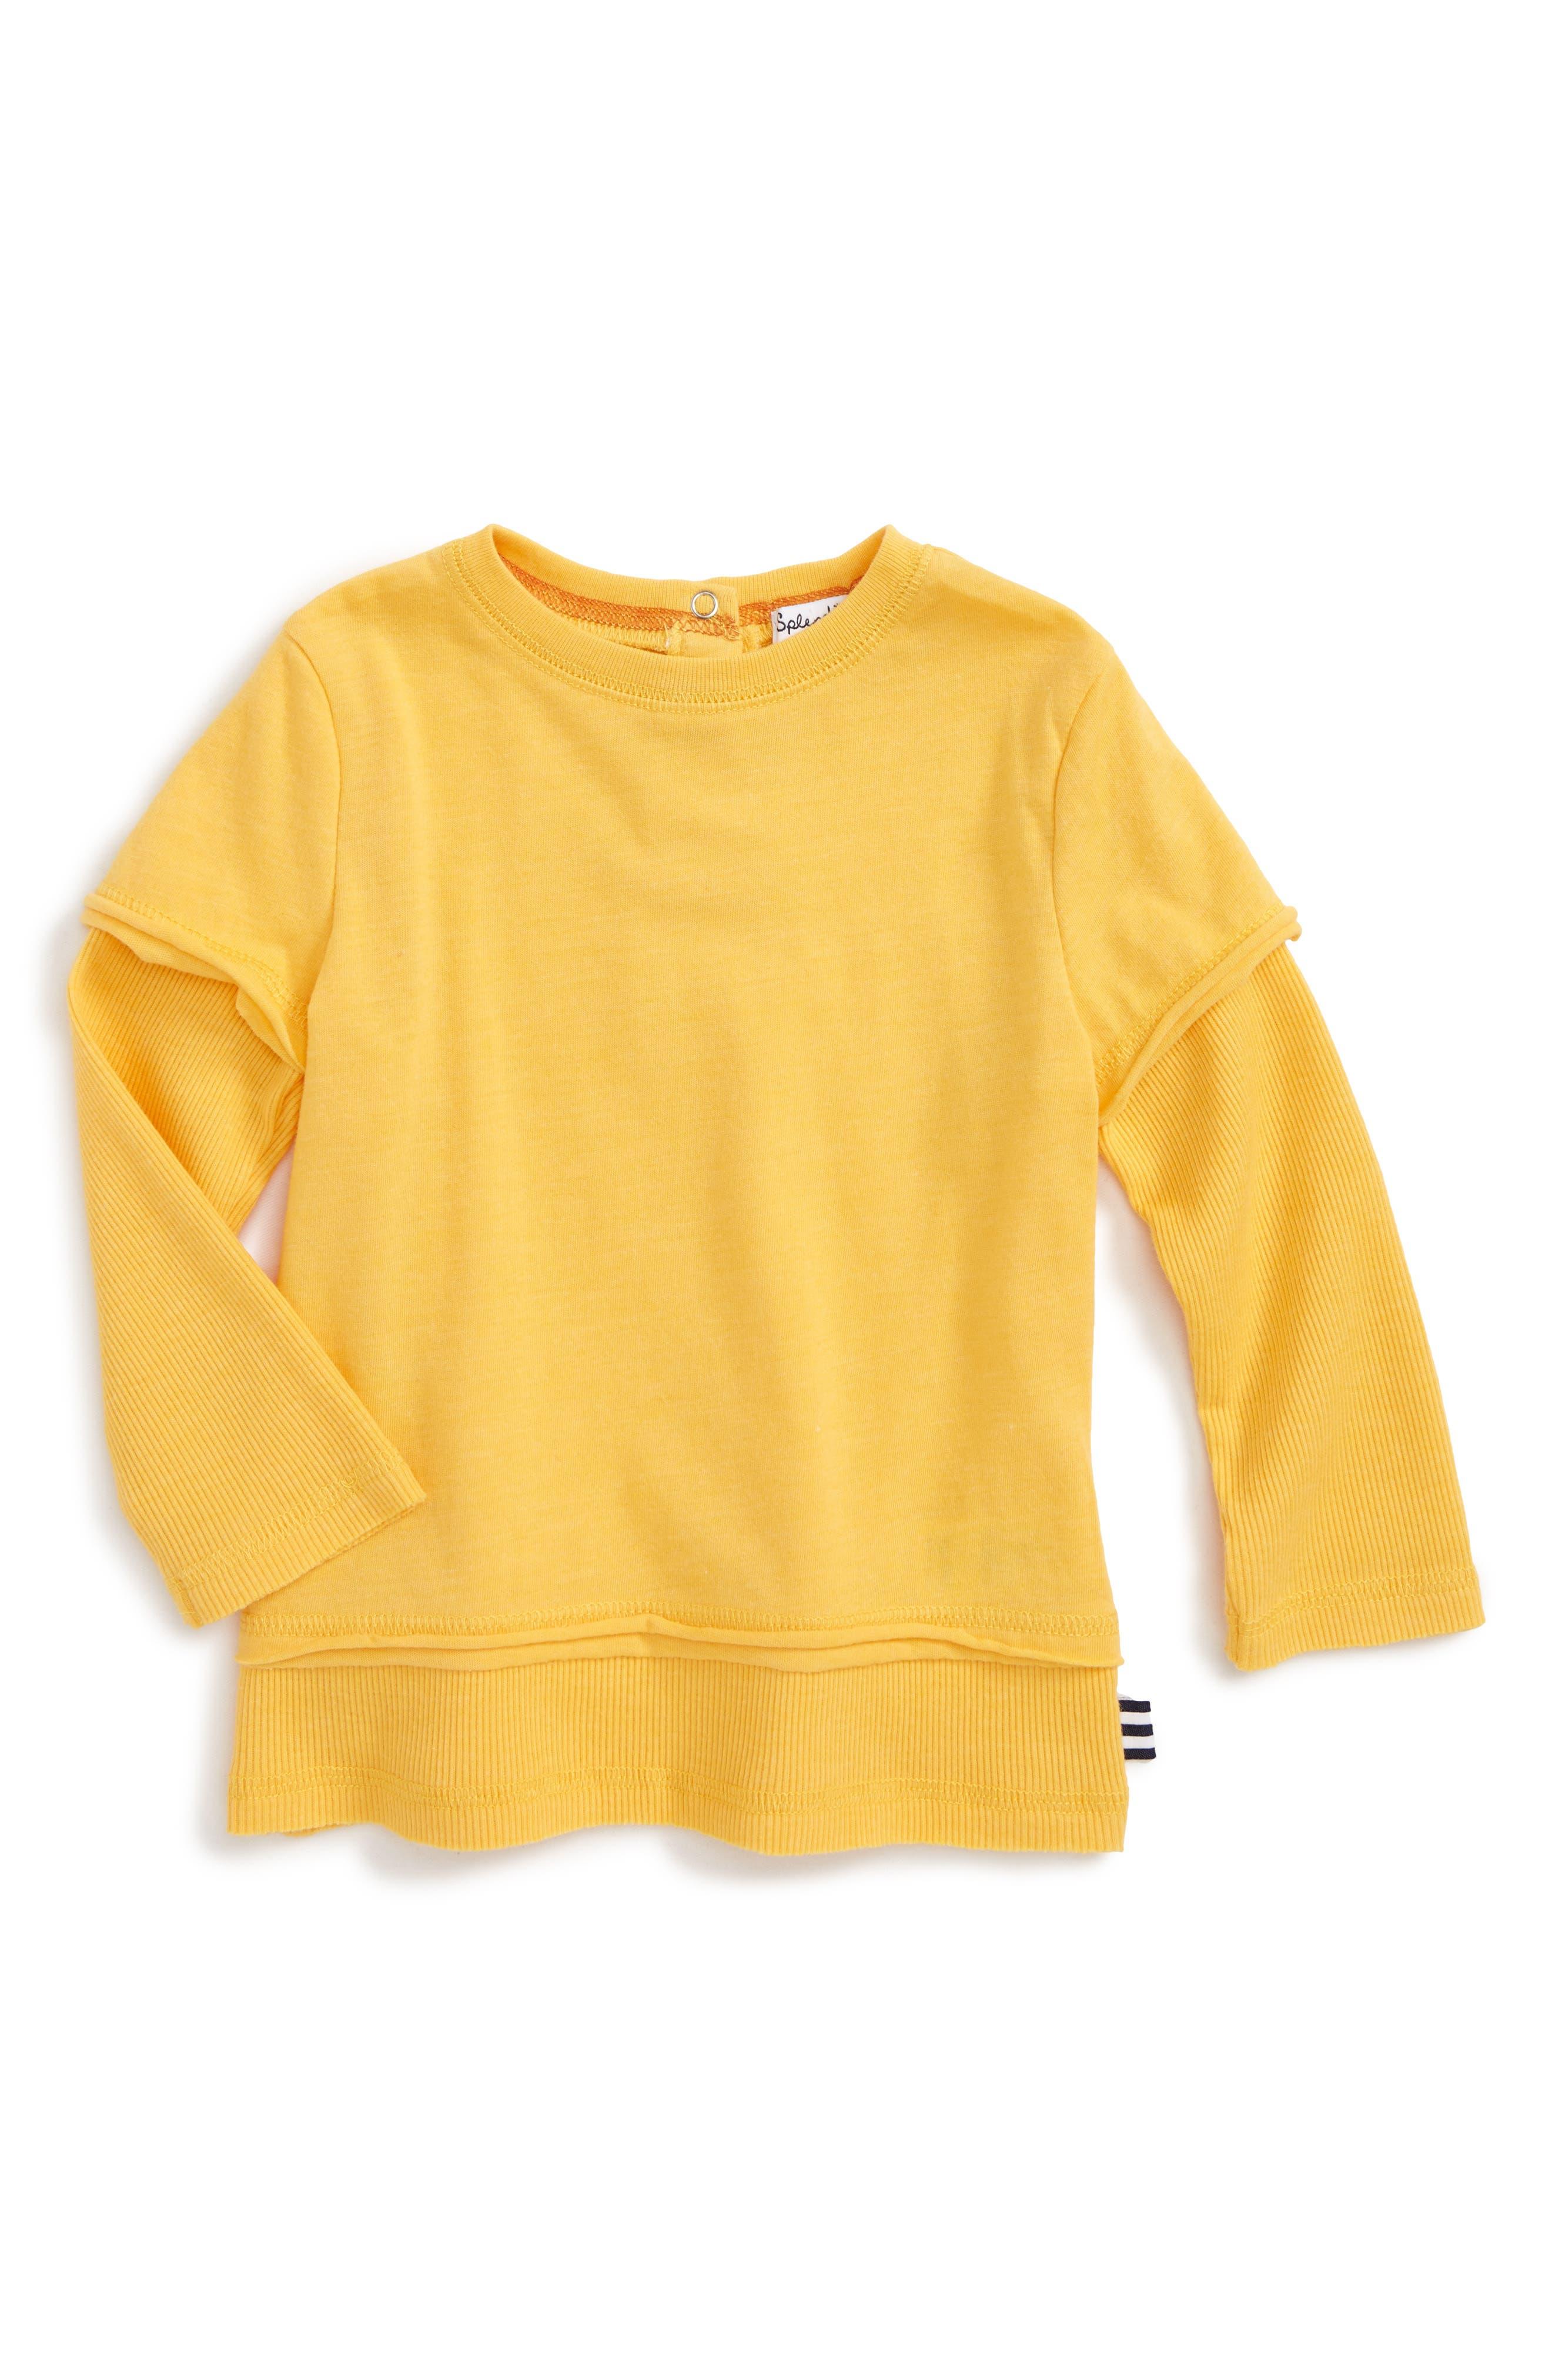 Splendid Long Sleeve T-Shirt (Baby Boys)